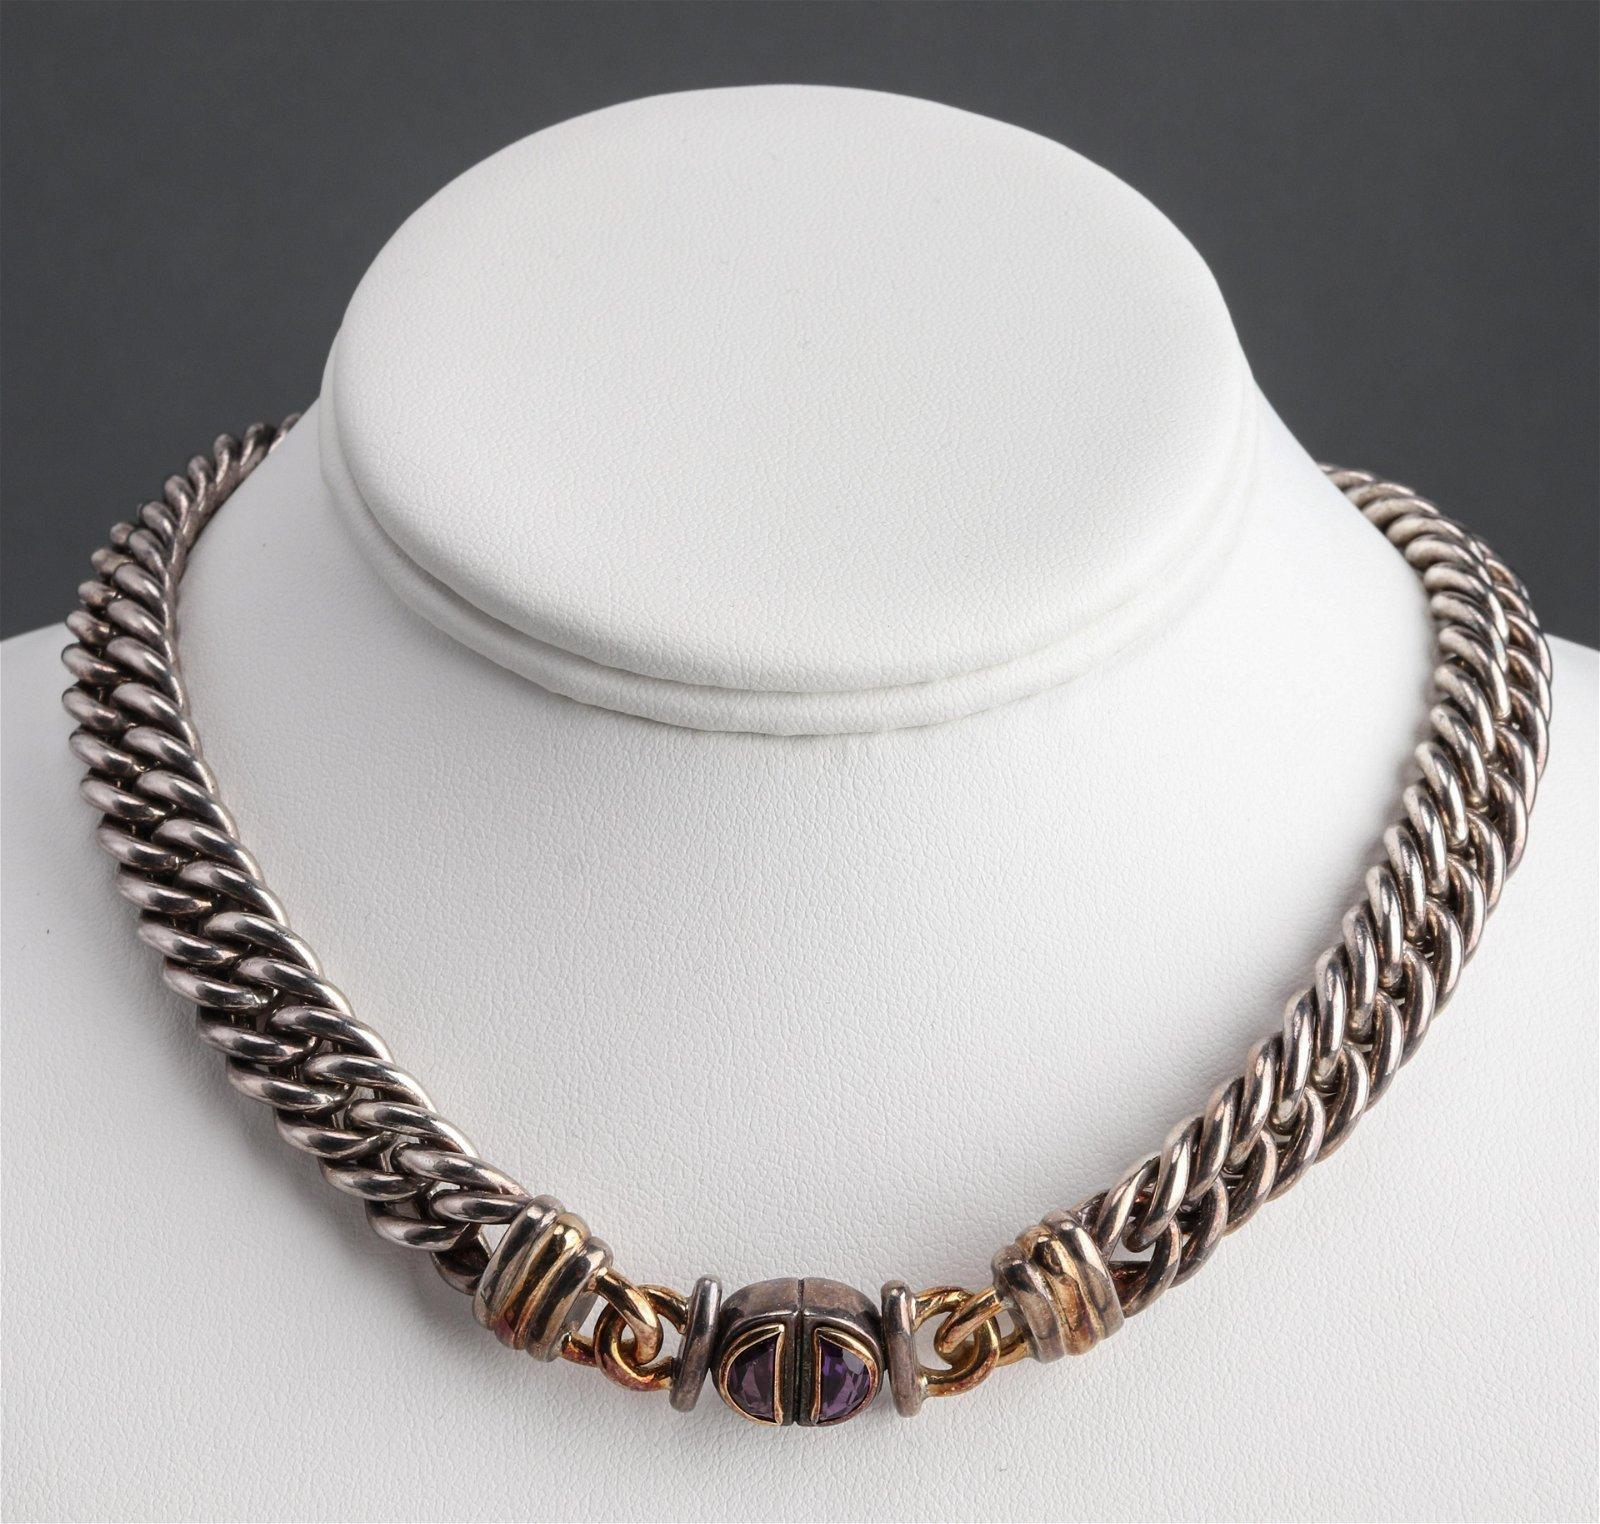 Christofle Silver, 18K Gold & Amethyst Necklace